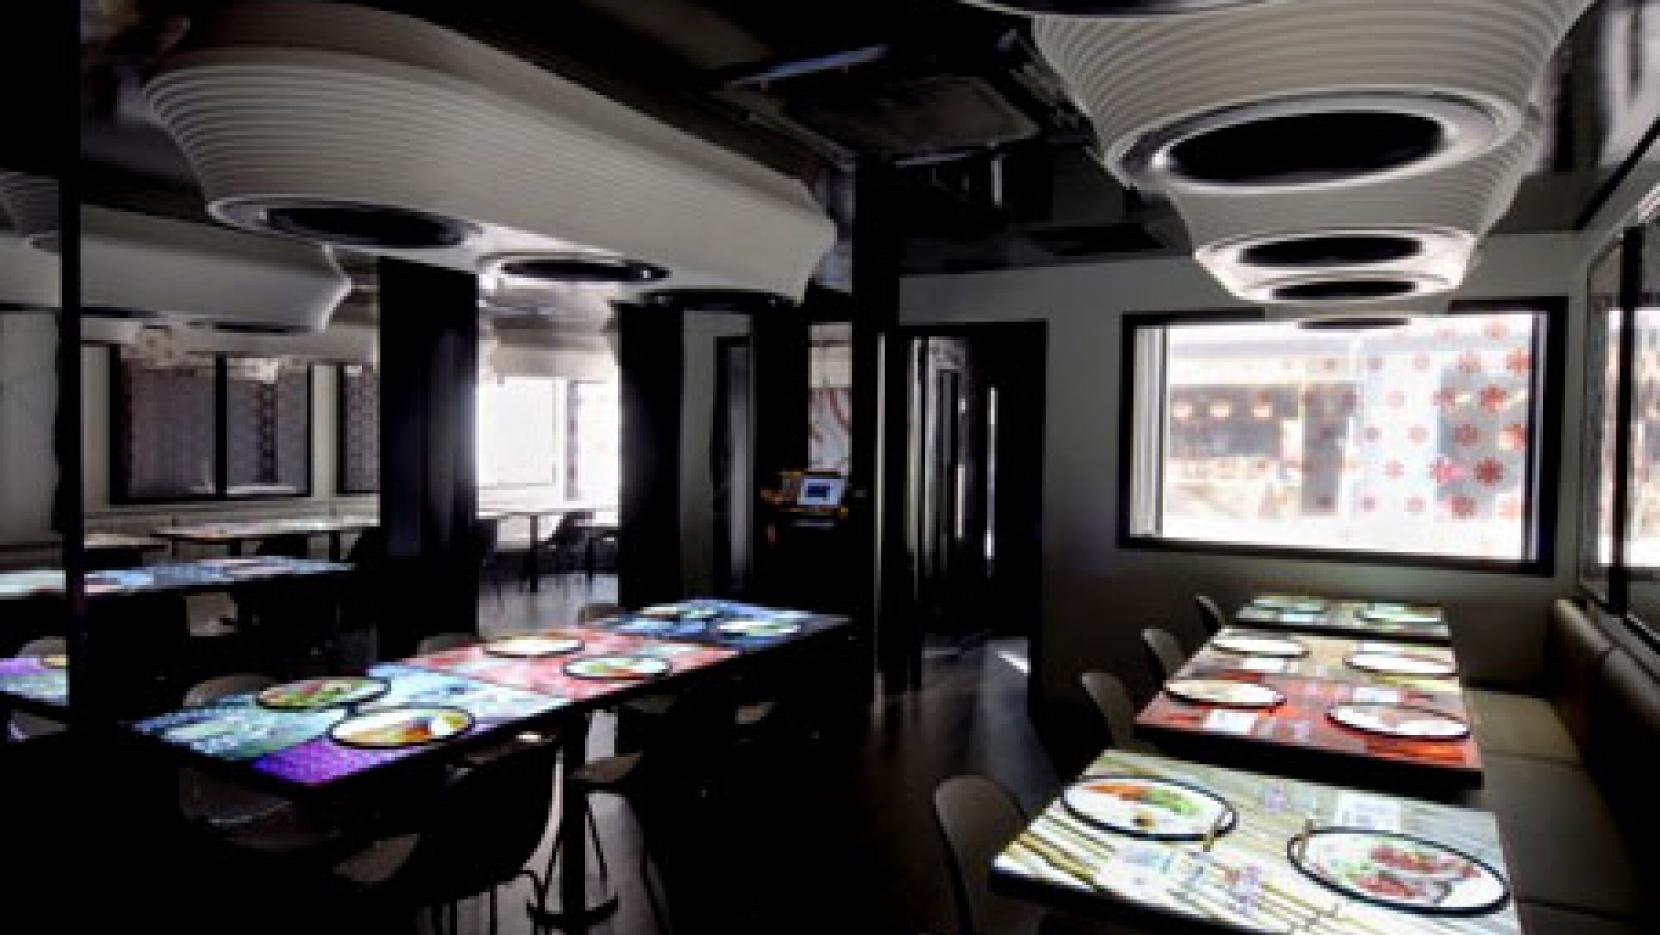 Inamo Restaurant by Blacksheep in London  Yatzer